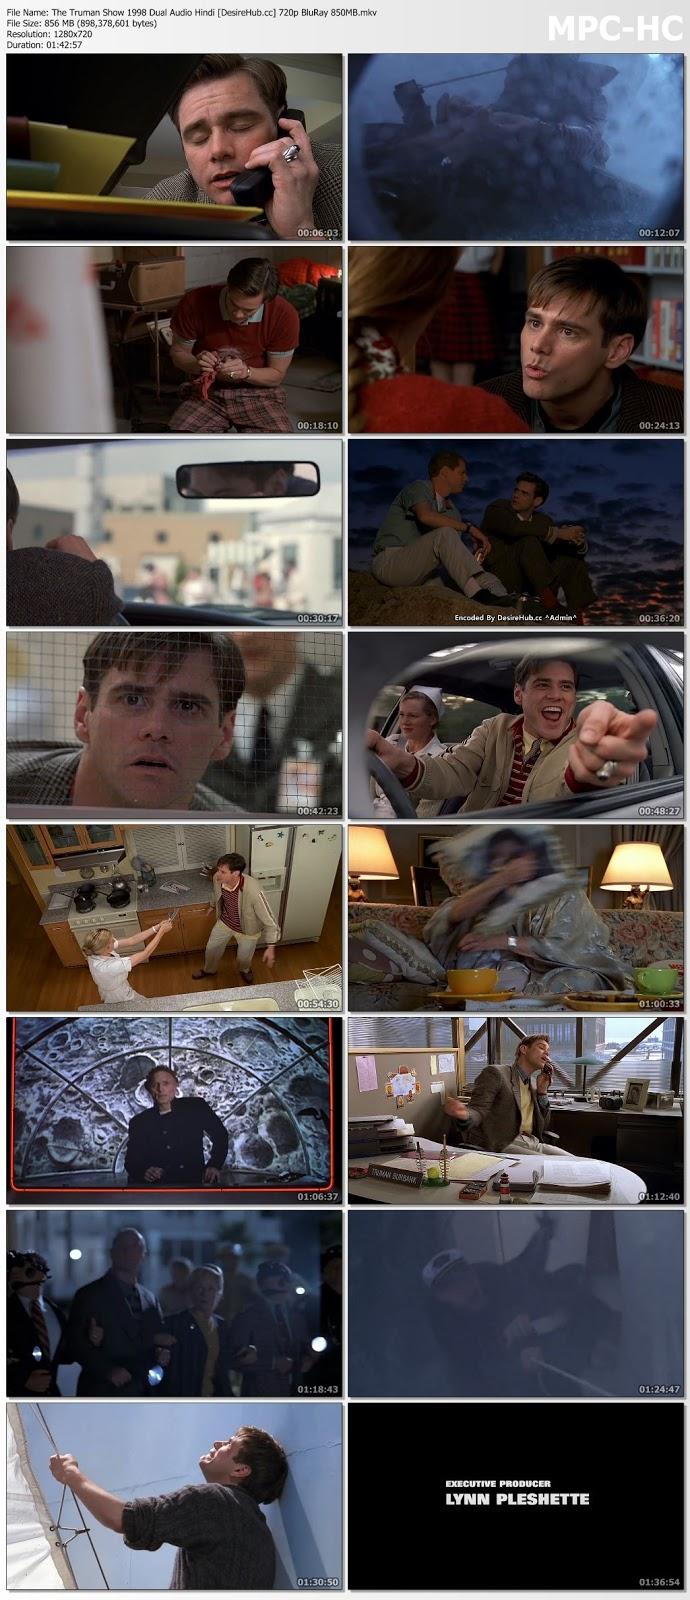 The Truman Show 1998 Dual Audio Hindi 720p BluRay 850MB Desirehub